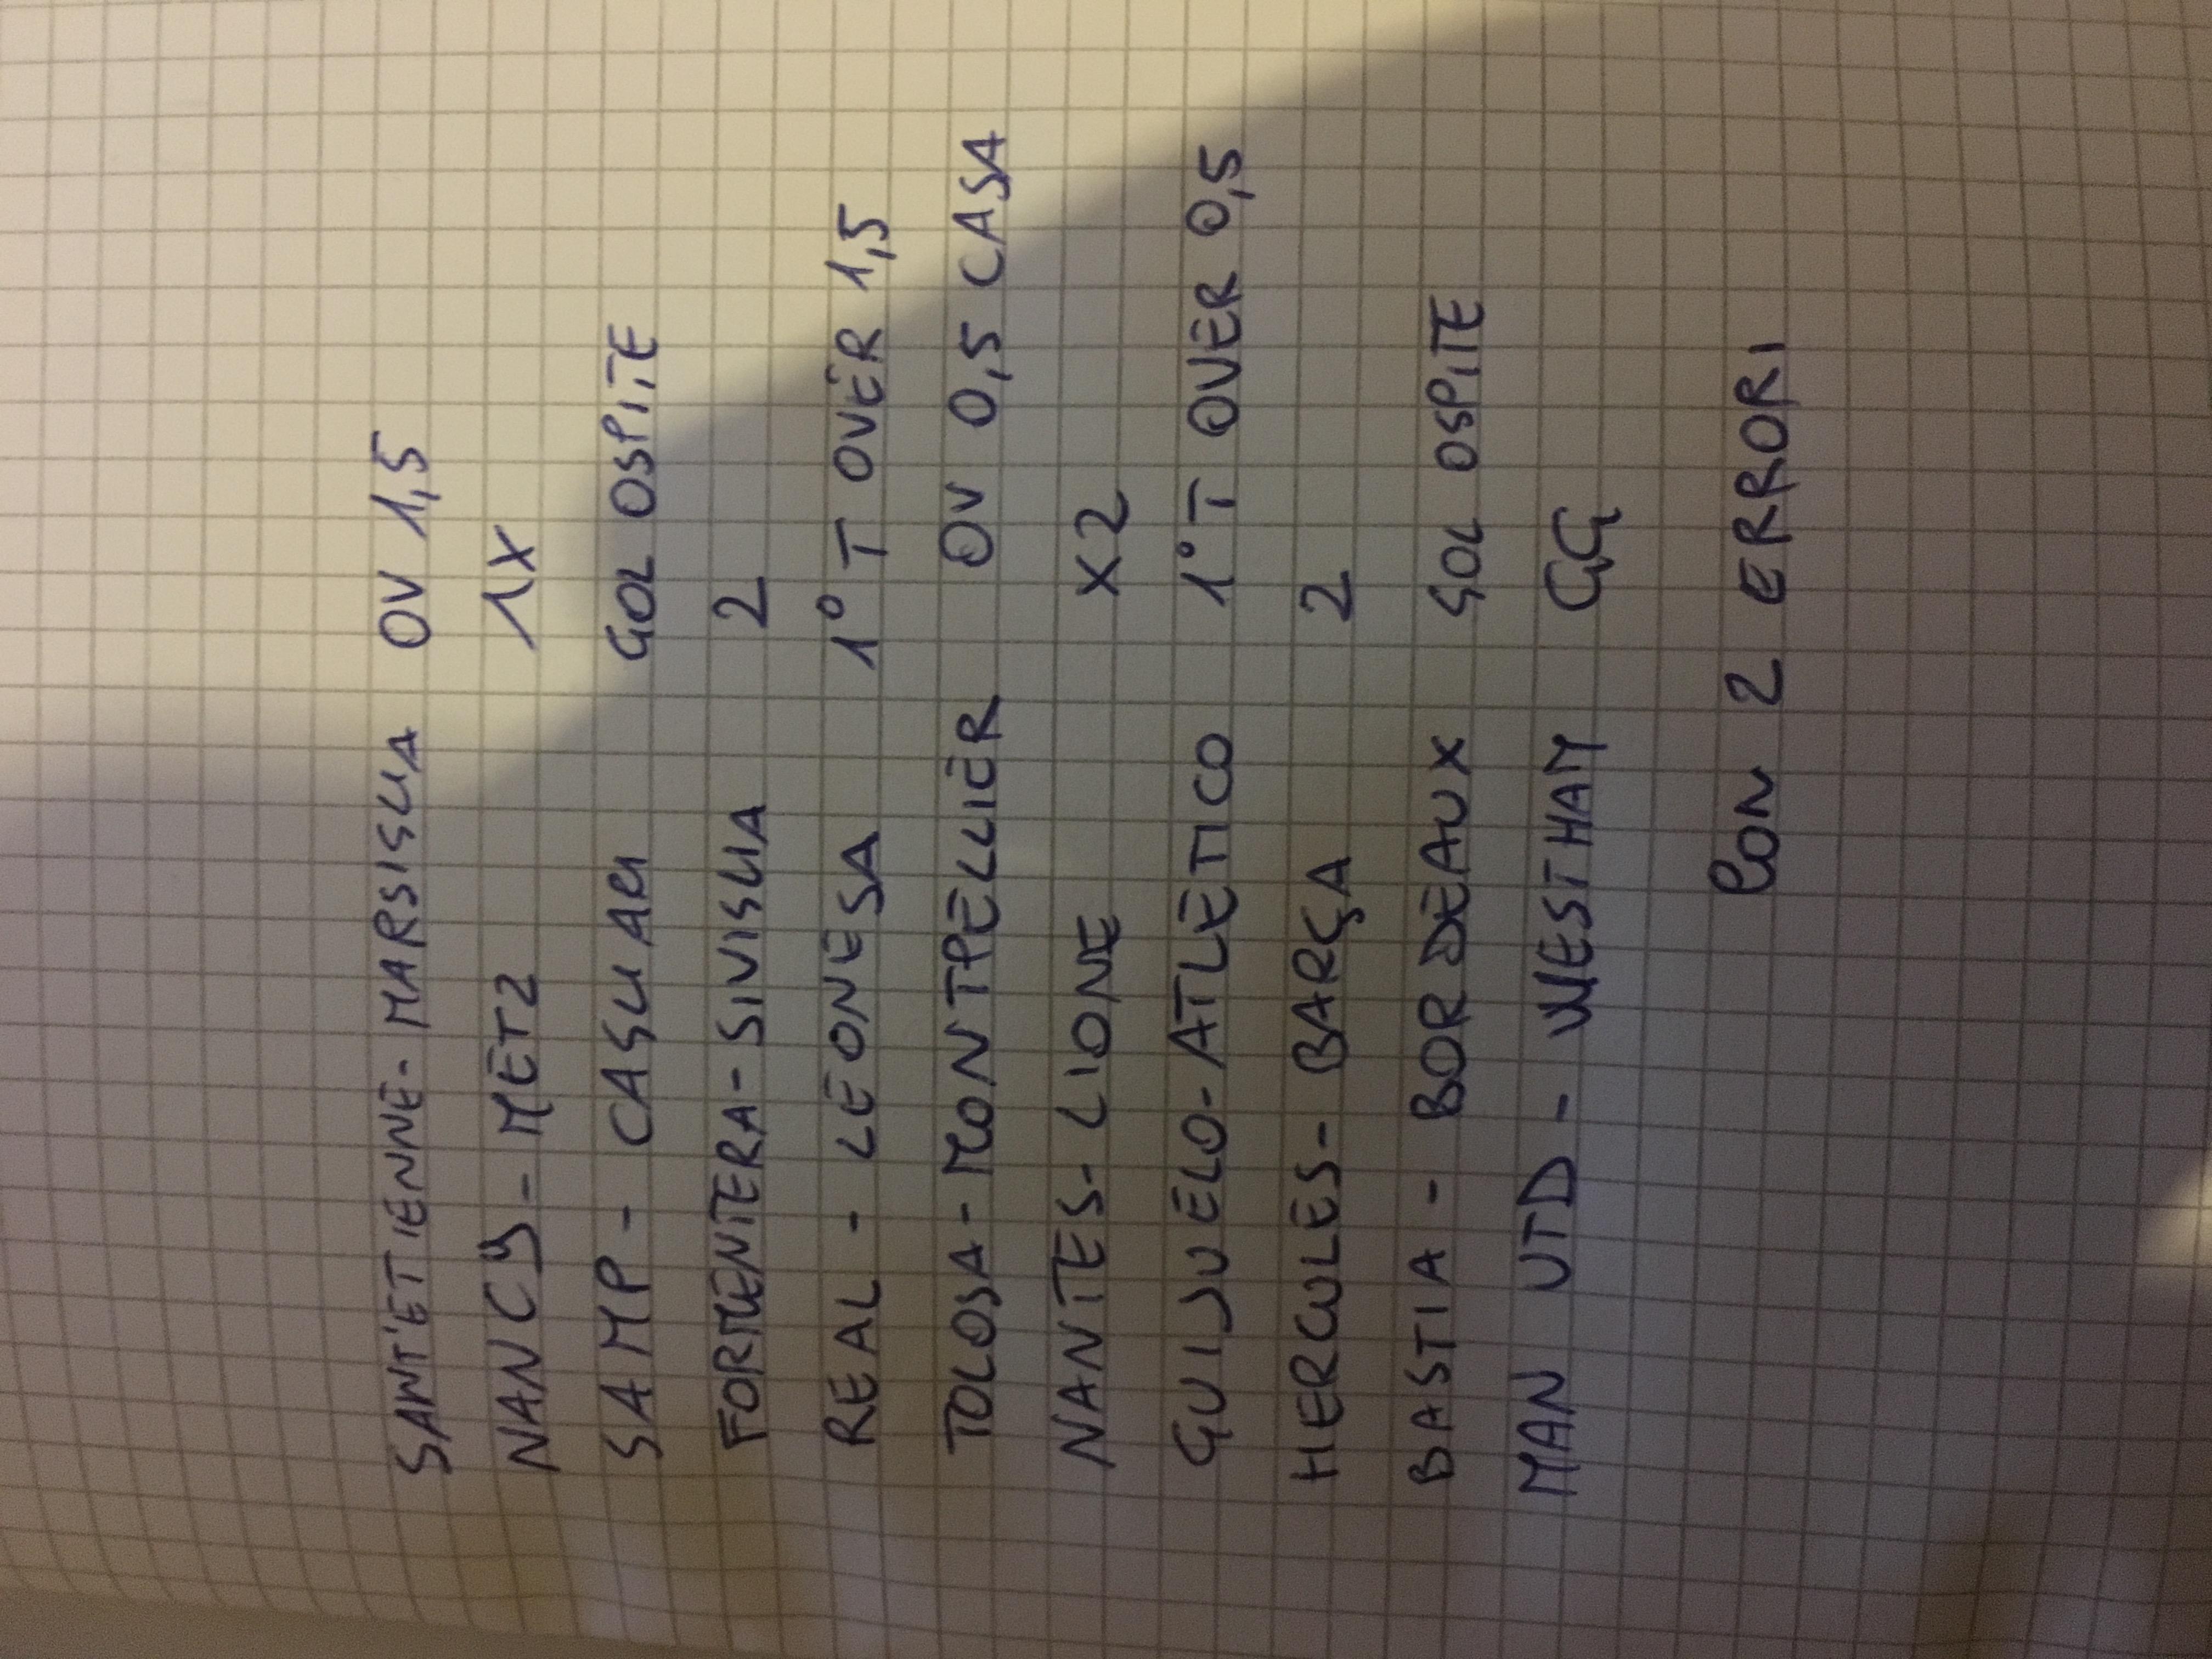 decom_80e57d5de71d9aa808bf853b3cbb531c_583f2c39bbcf6.JPG